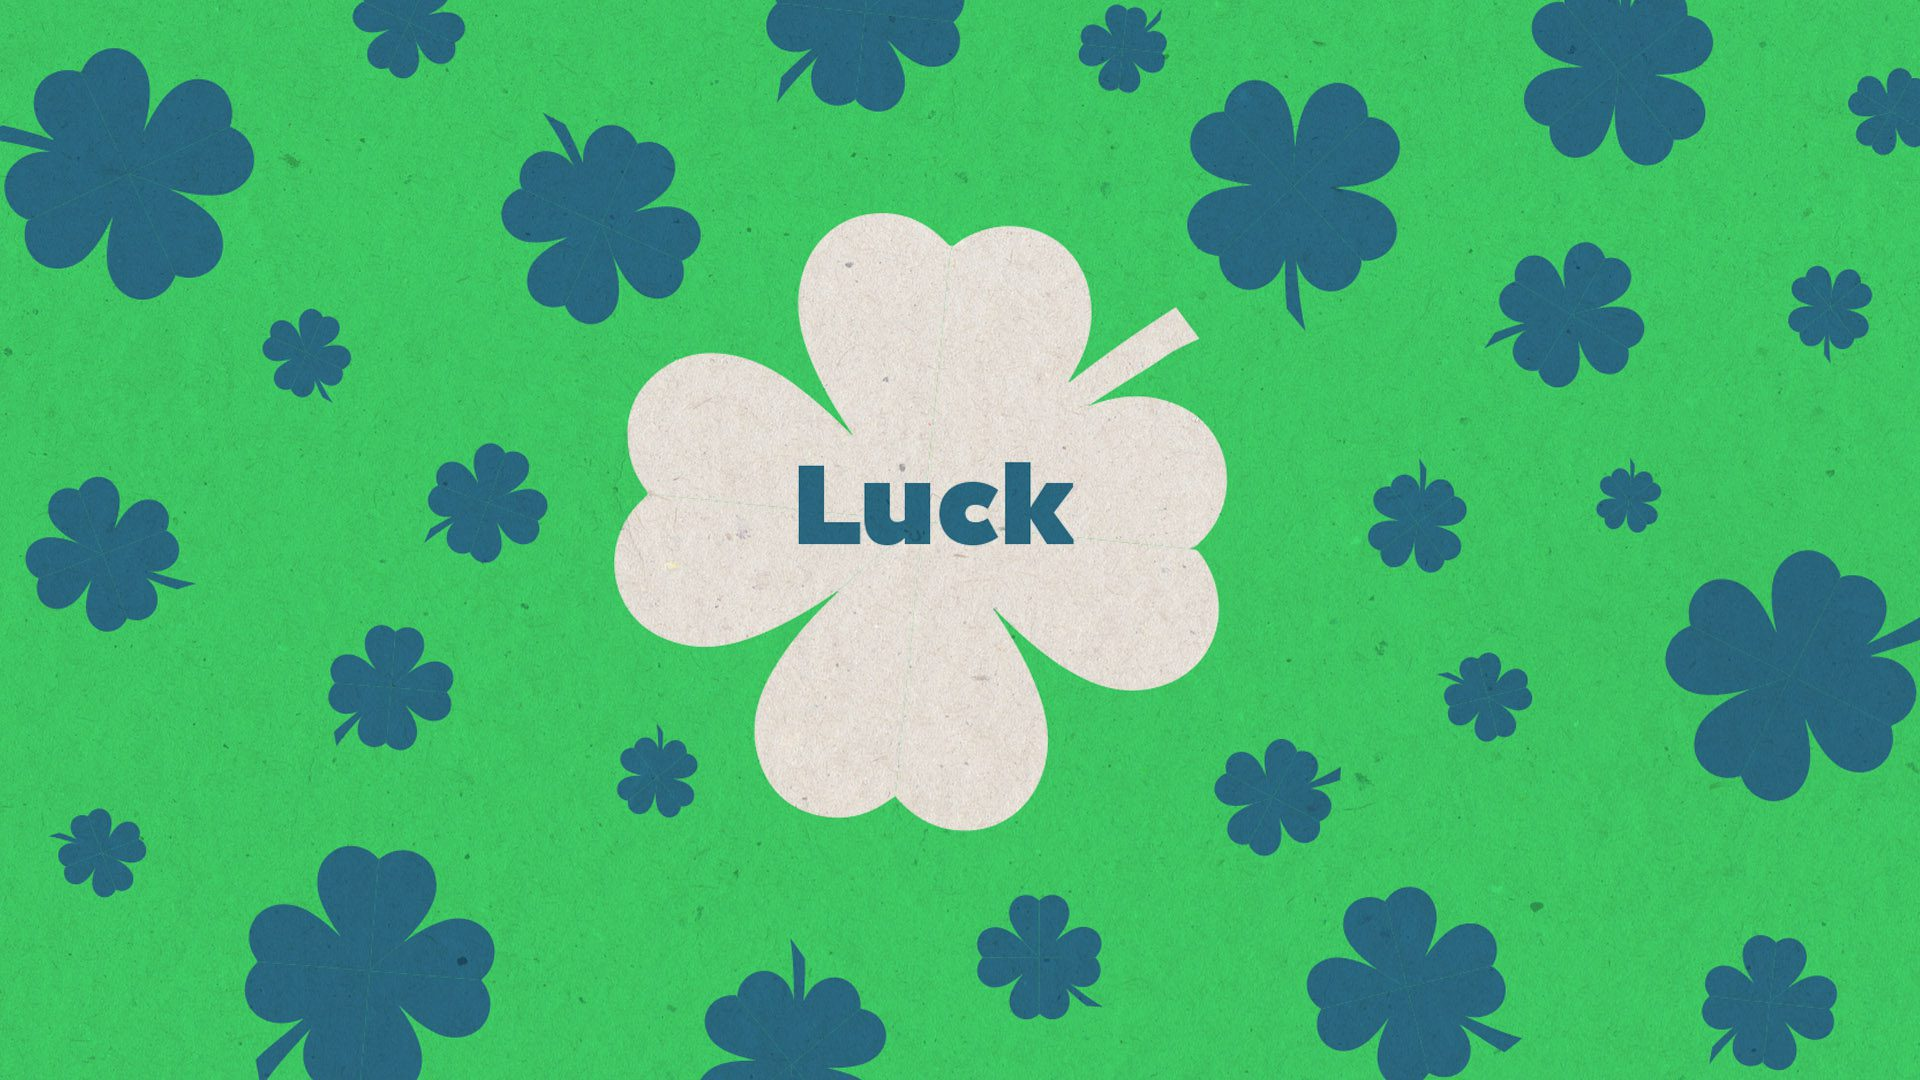 Online Energizer Luck